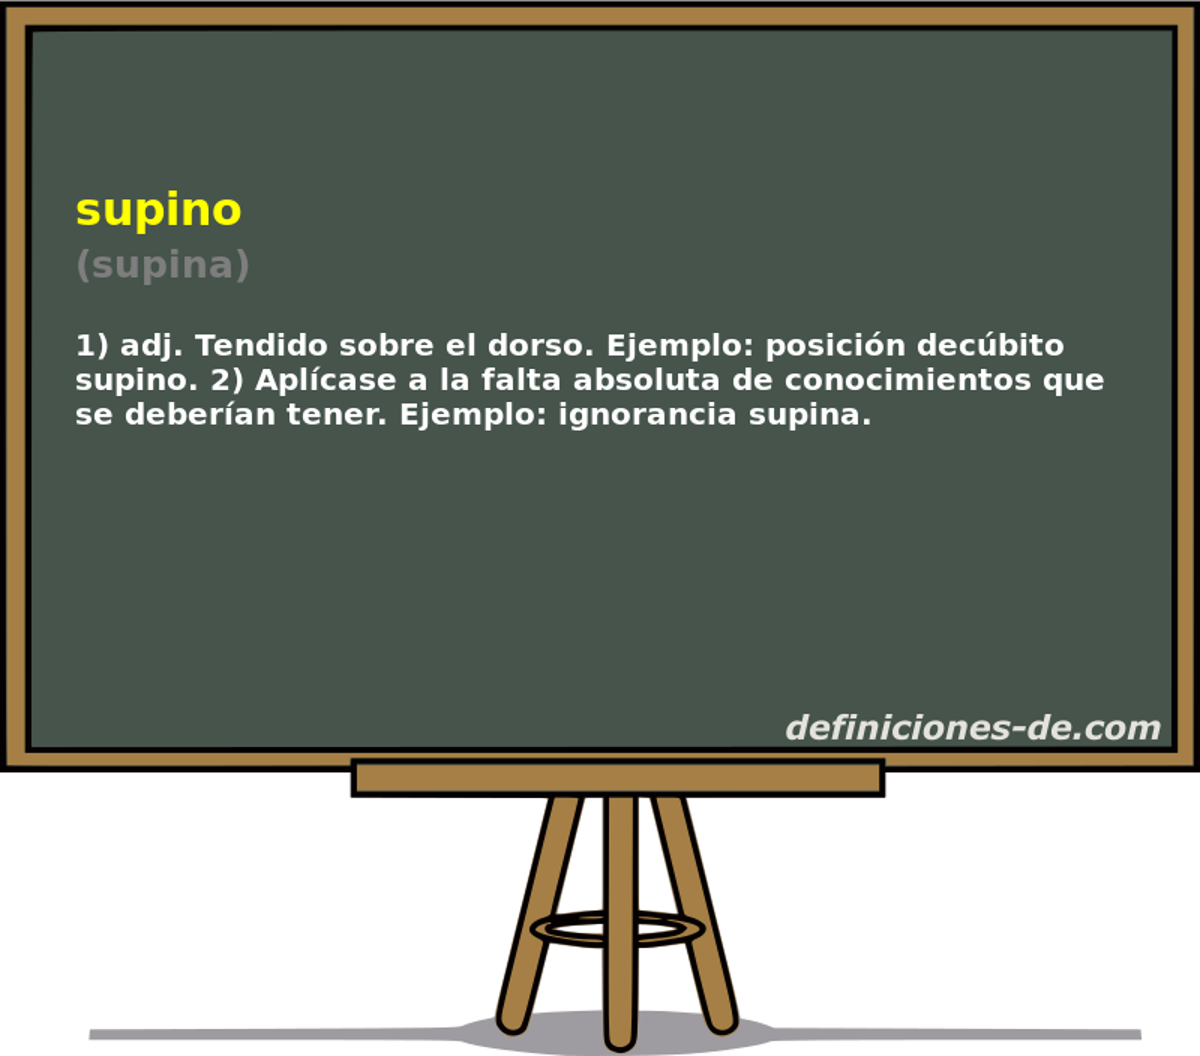 Qué significa Supino (supina)?